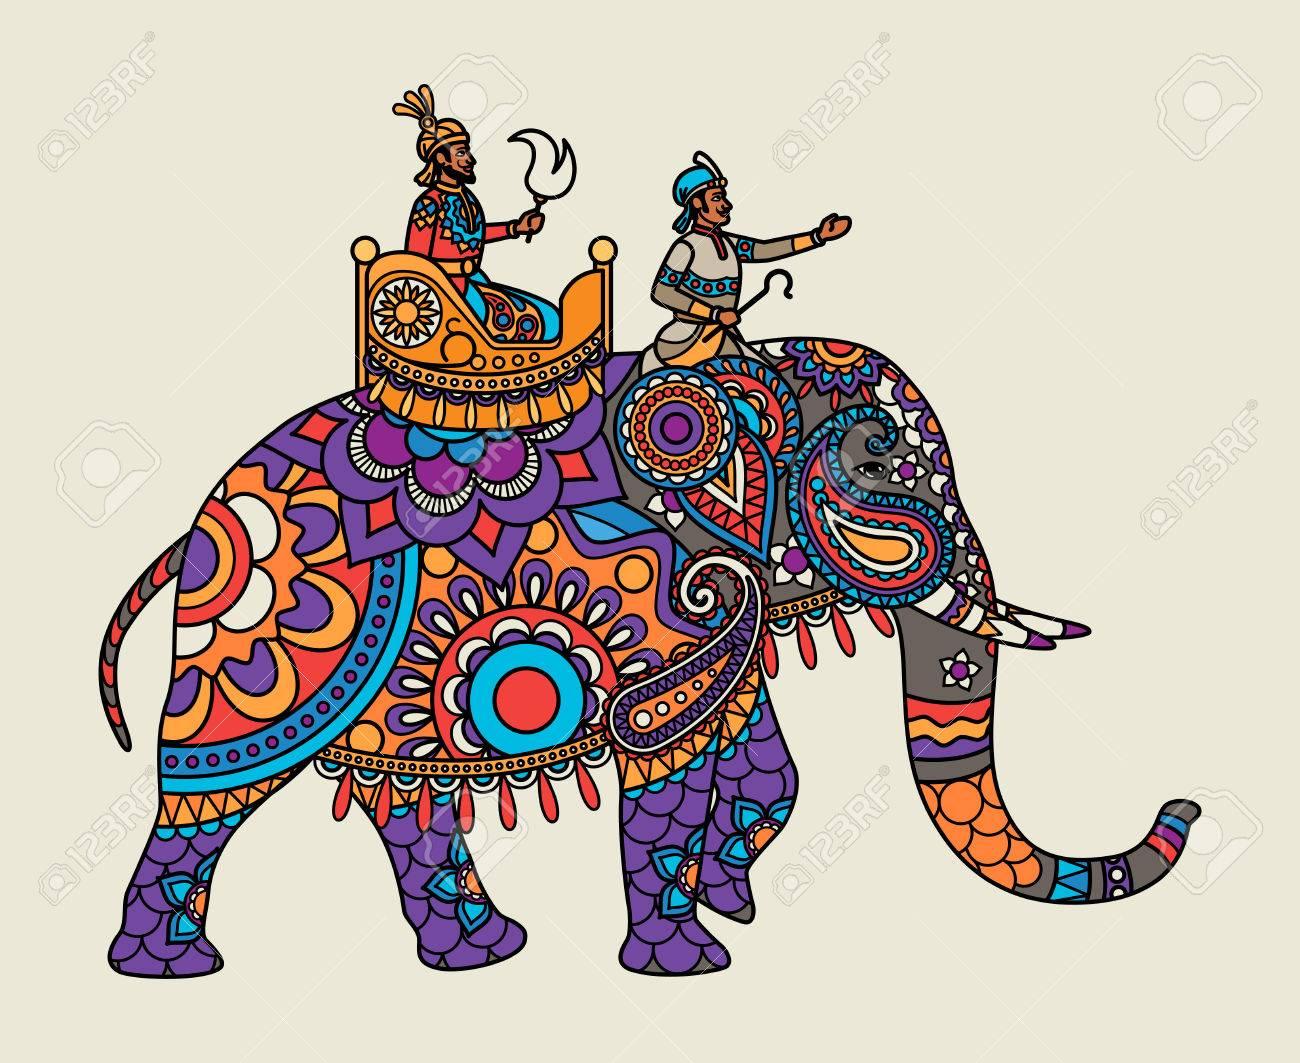 Indian ornate maharajah on the elephant. Vector illustration - 60438980